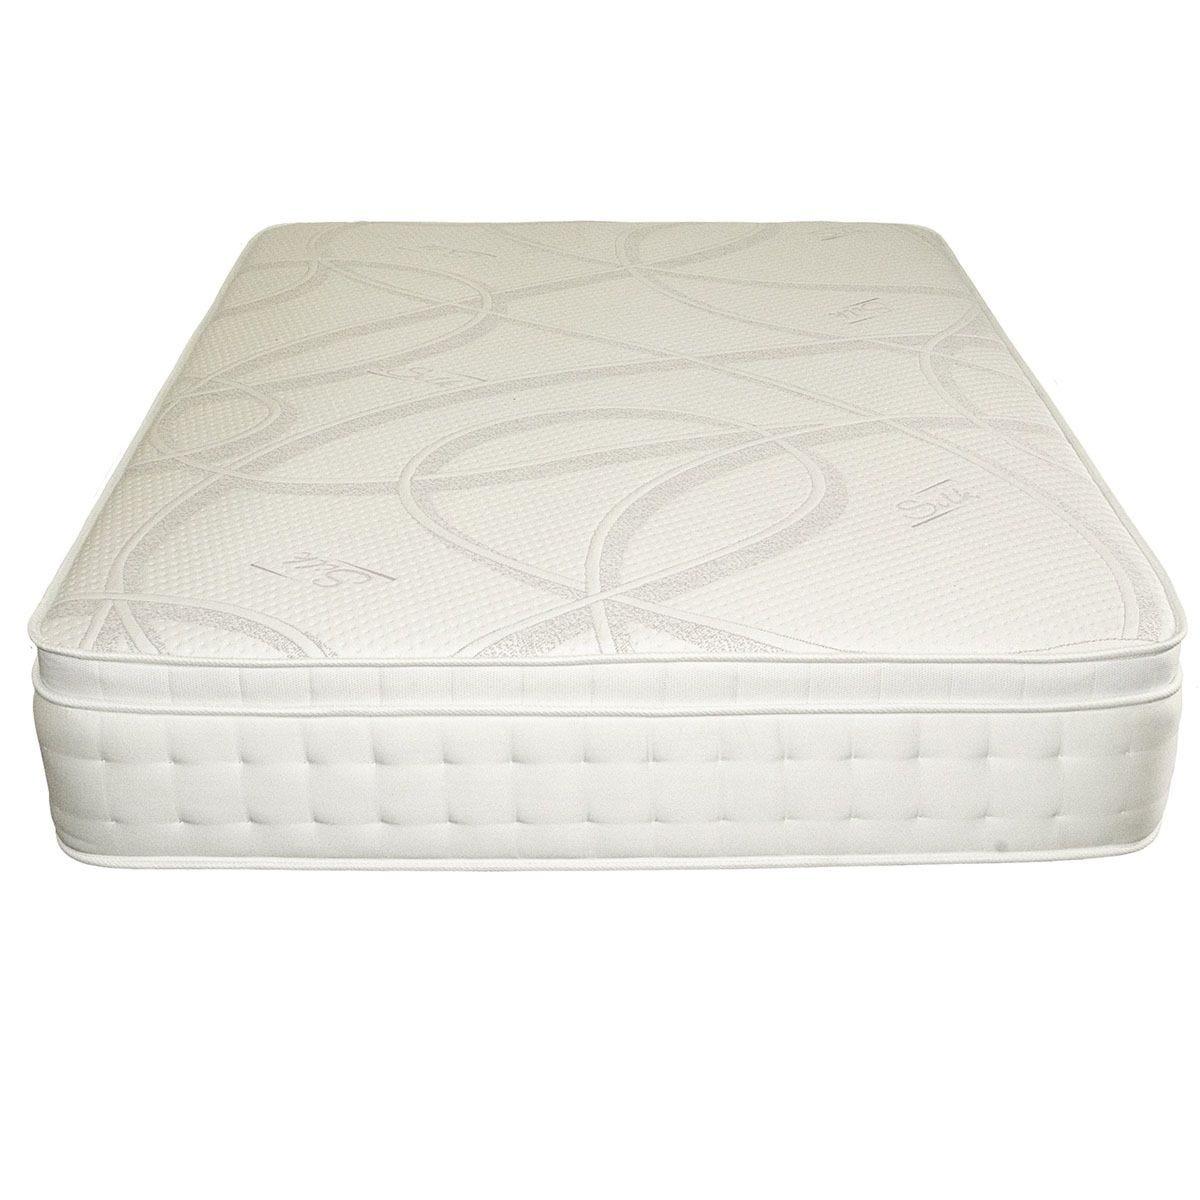 Comfy Deluxe 1500 Pocket Silk Mattress - White